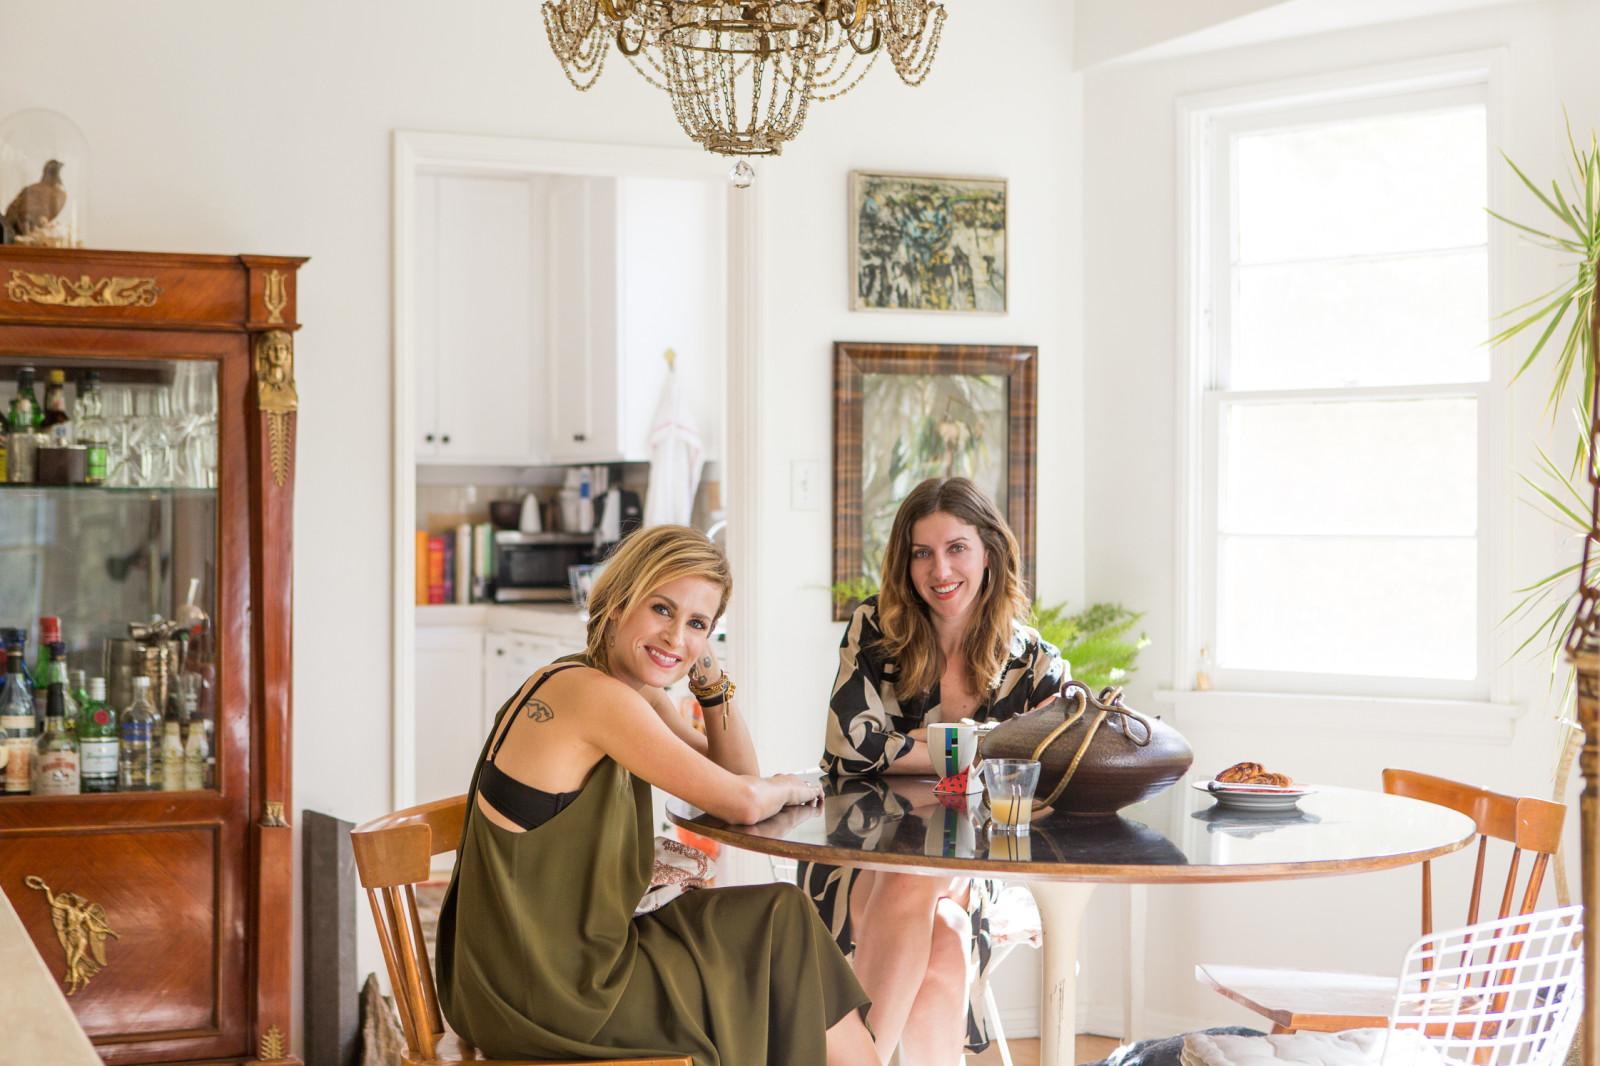 Genevieve Dellinger U0026 Martha Mulholland. Photographer U0026 Interior Designer  ...